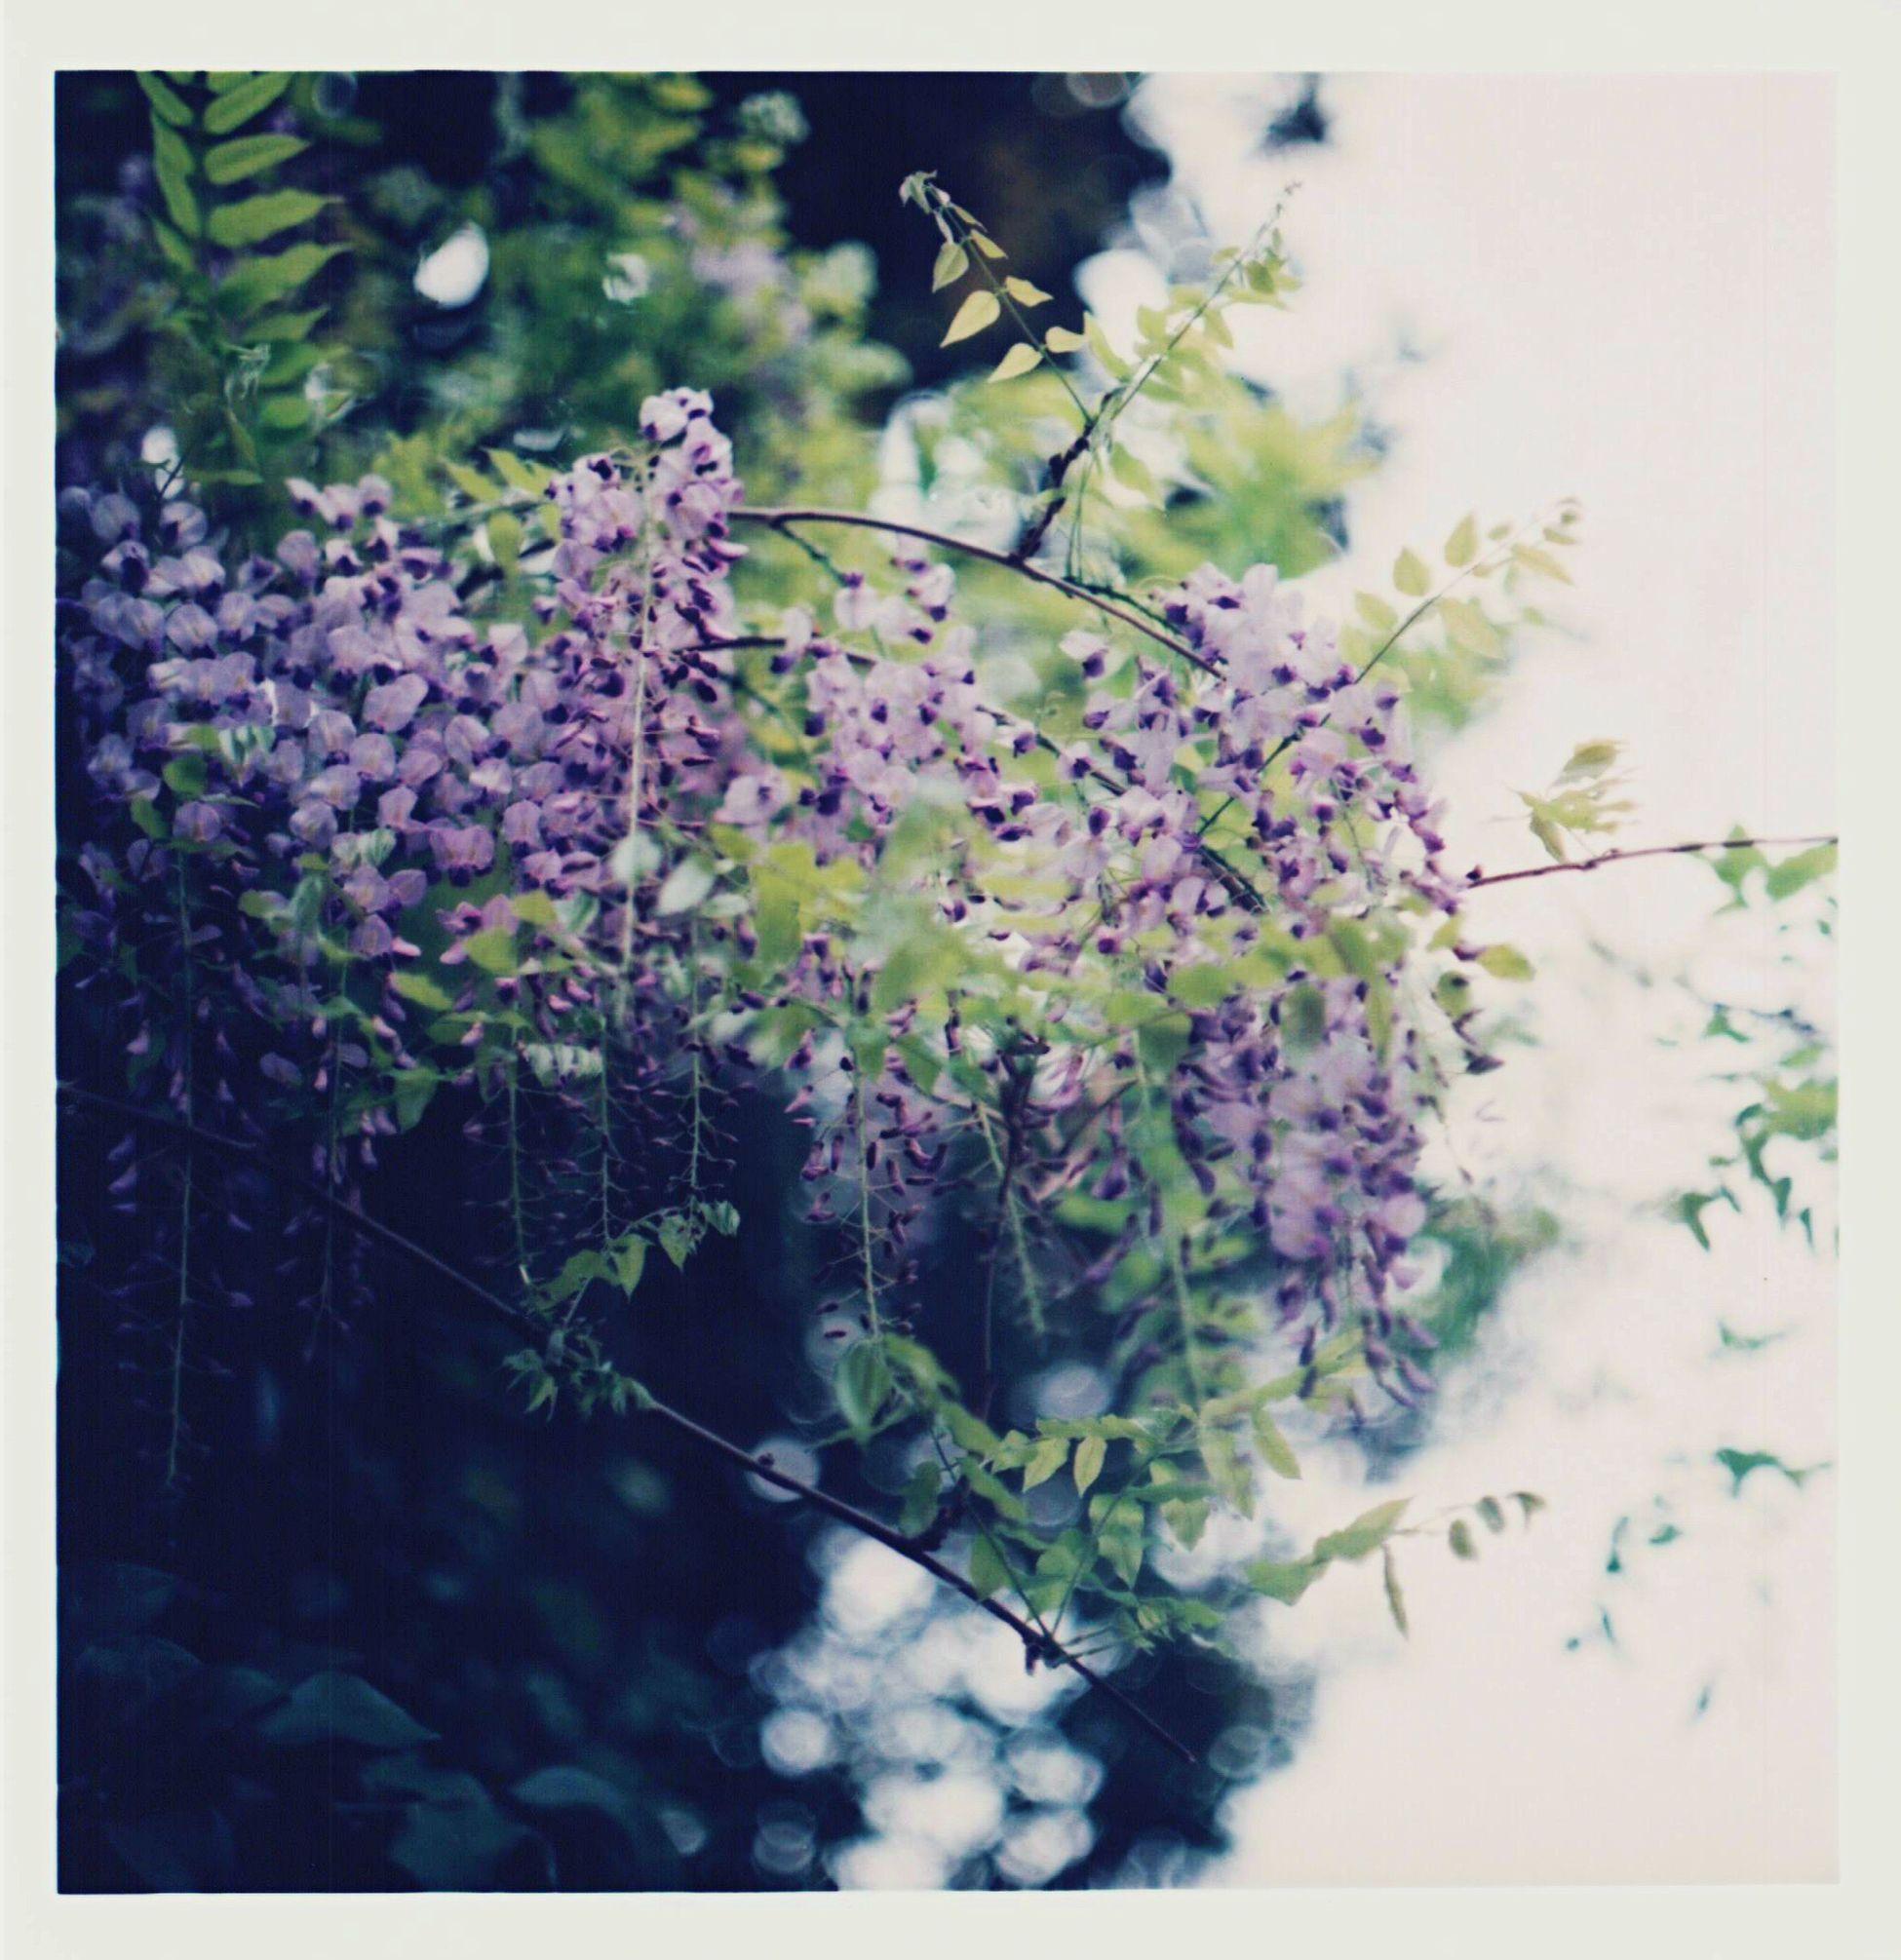 Fuji cascade Film Filmcamera Film Photography Fujifilm Fuji Pro400H Pentacon Pentacon Six Pentacon Six Tl Zeiss Flower Purple Flower Purple